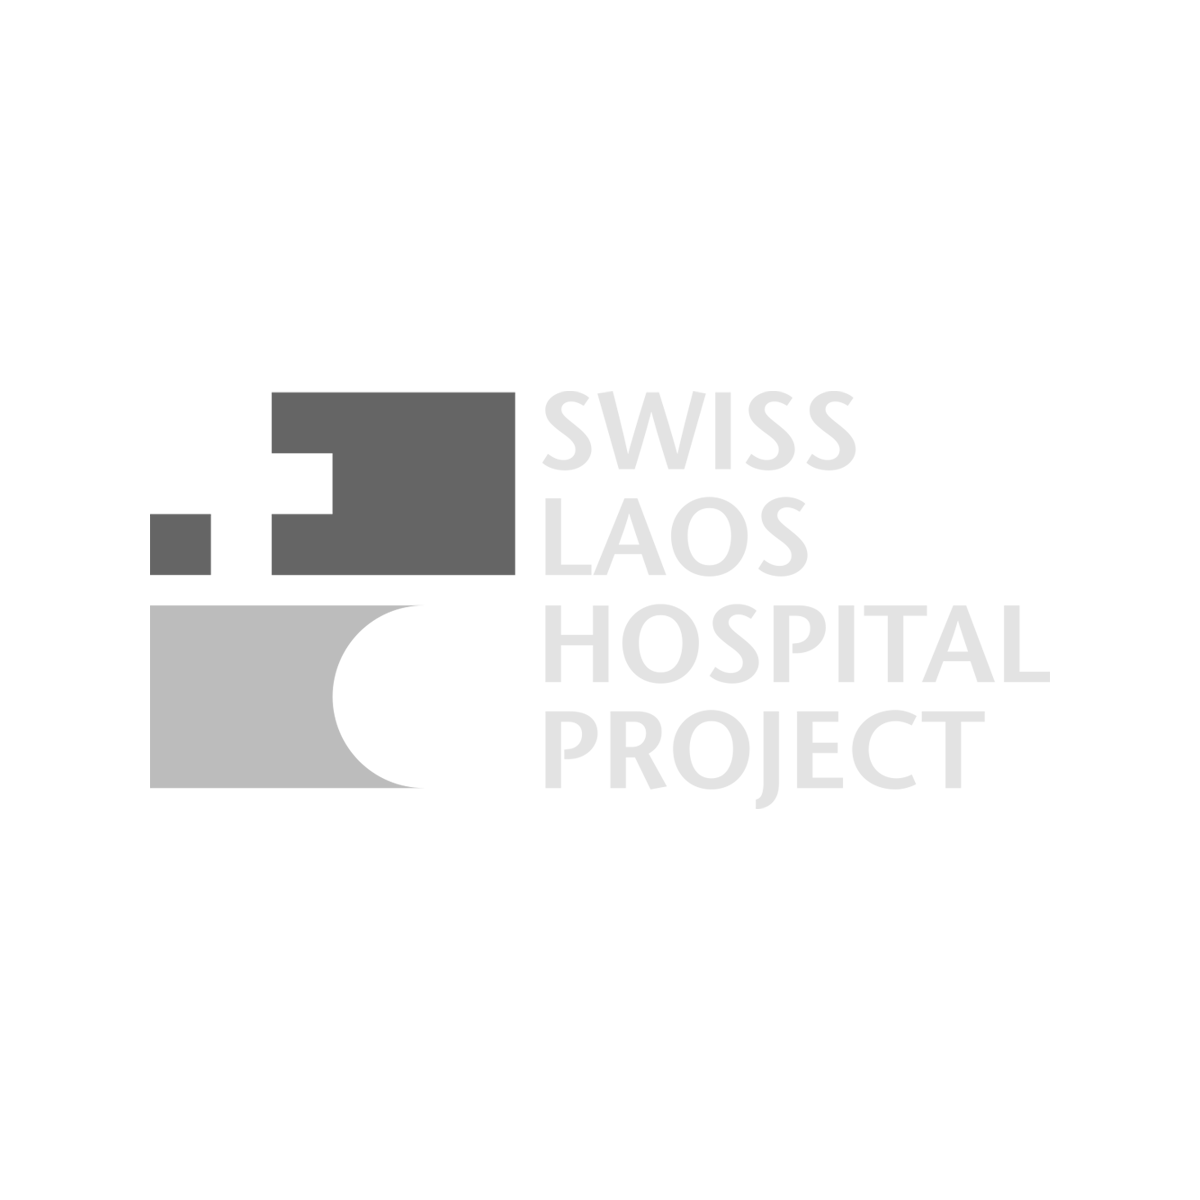 Swiss Laos Hospital Project Logo